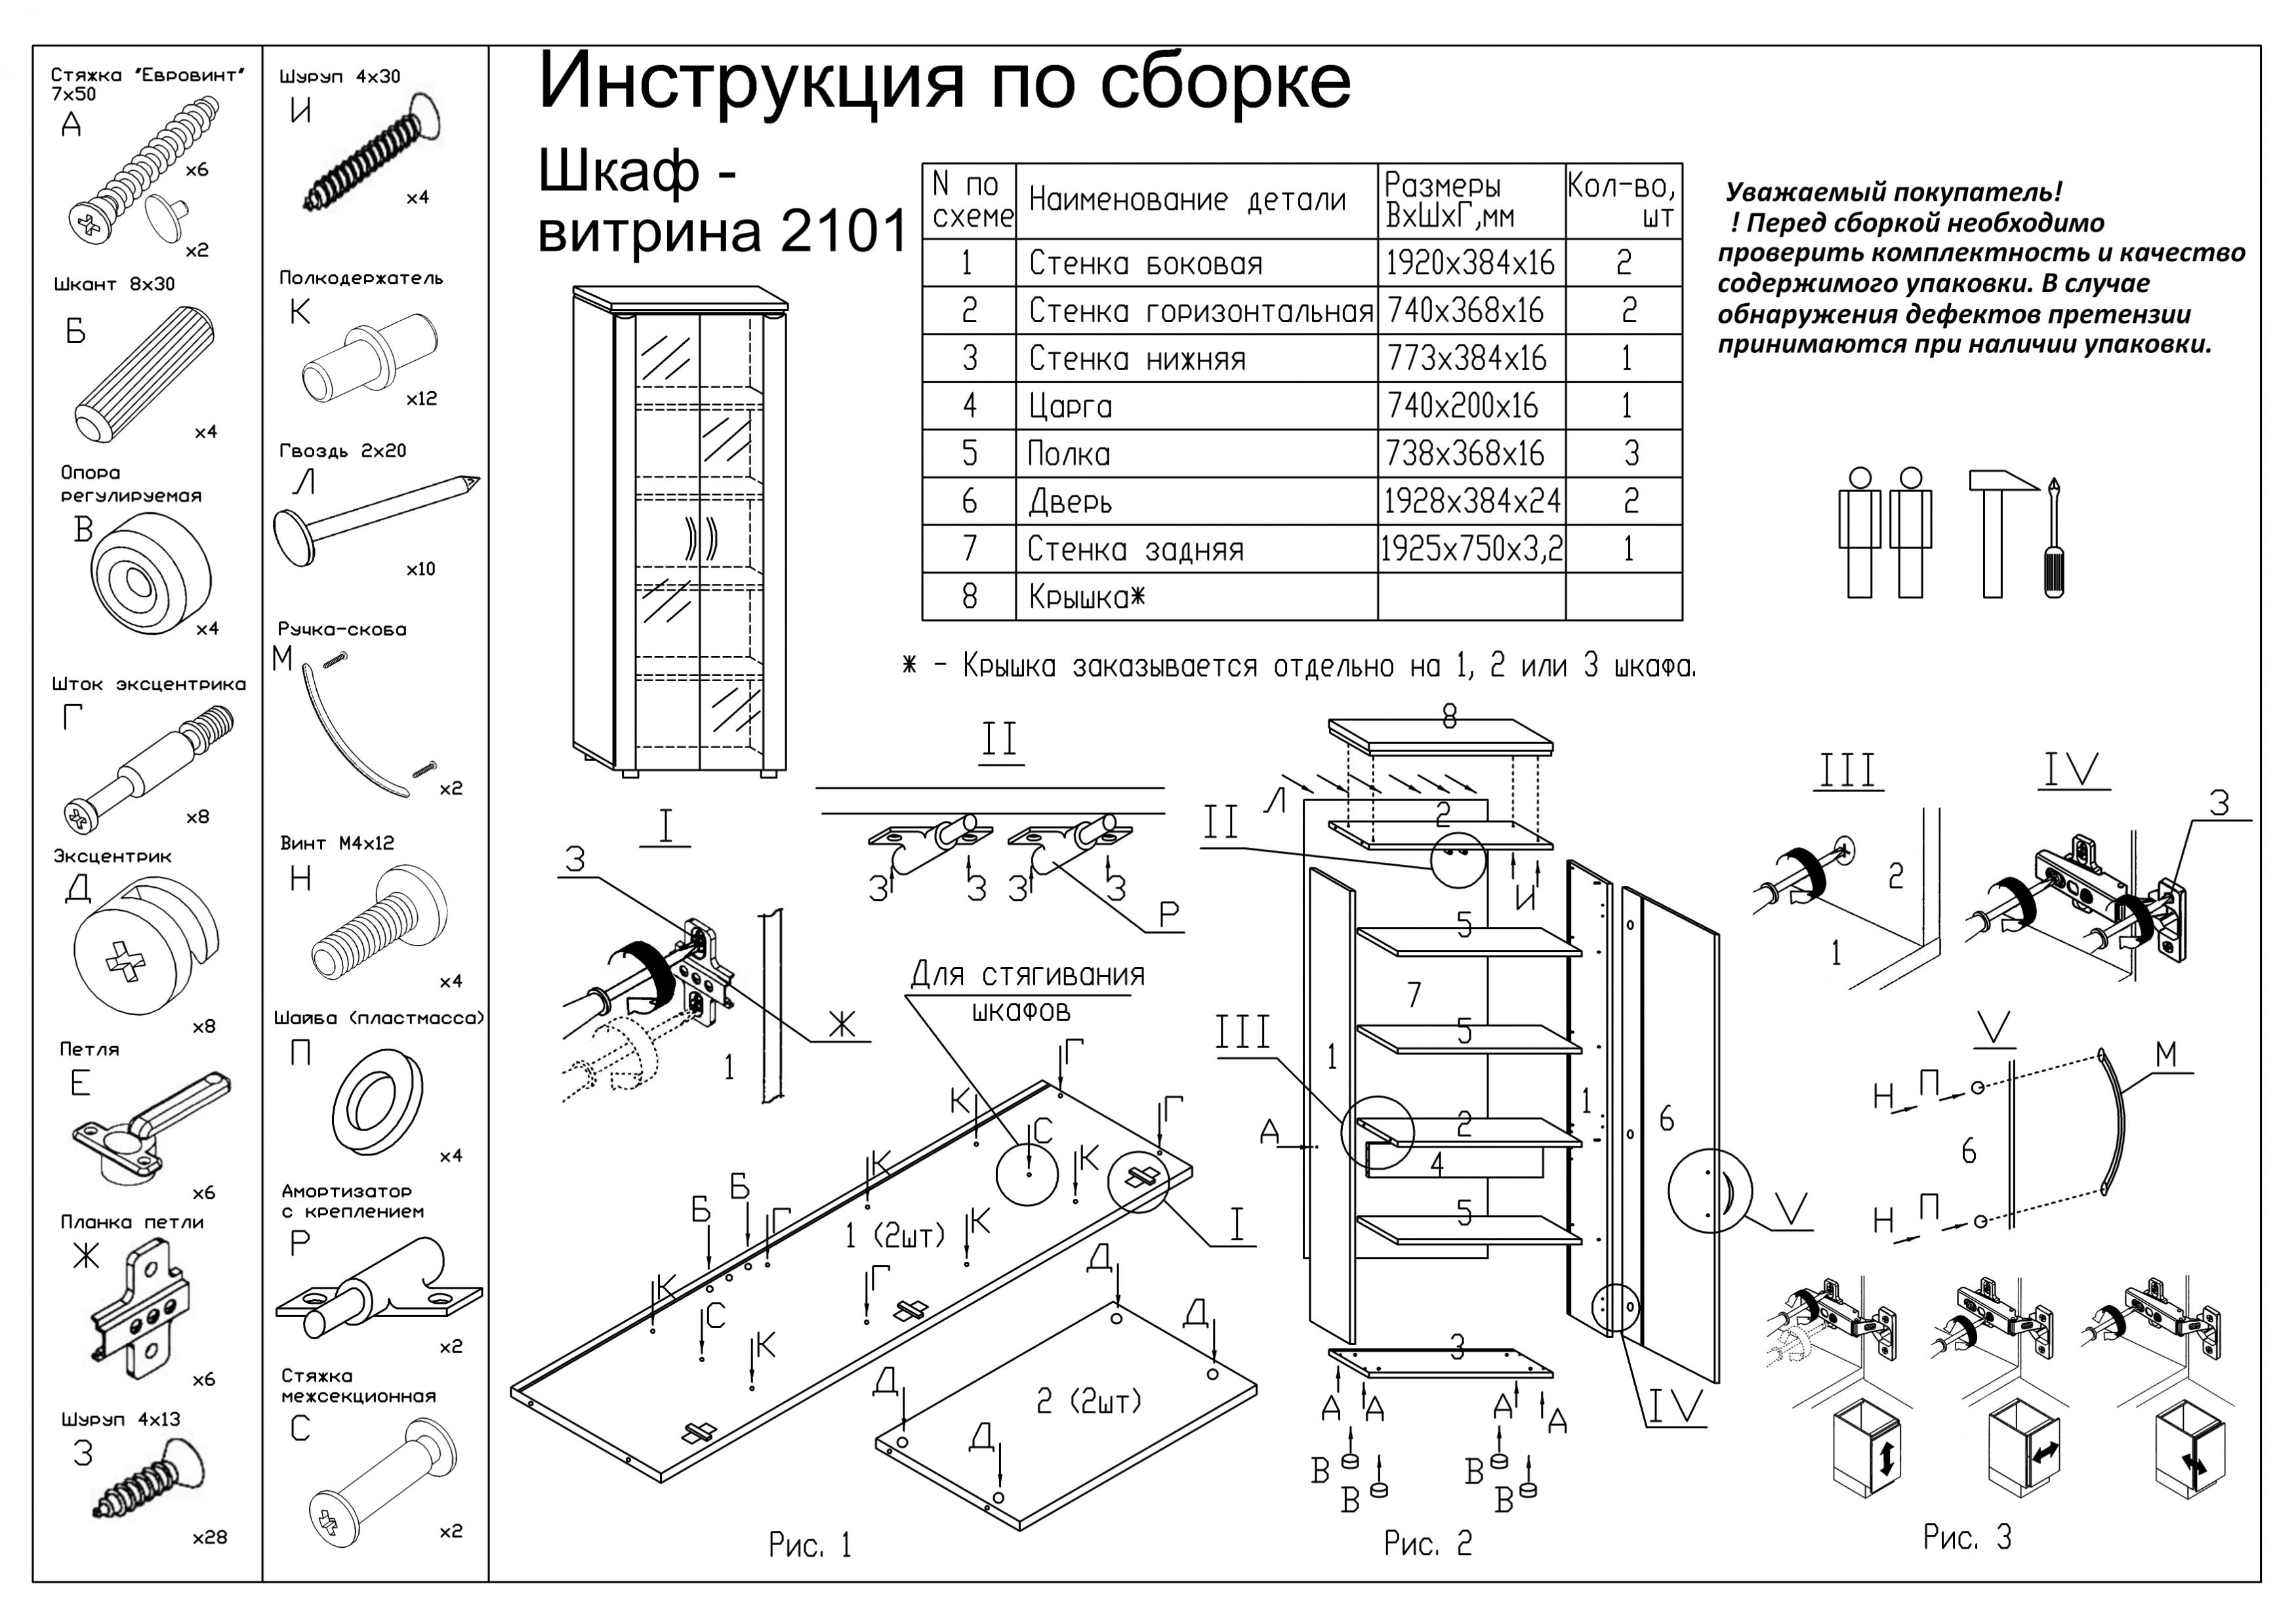 Сборка шкафа своими руками инструкция